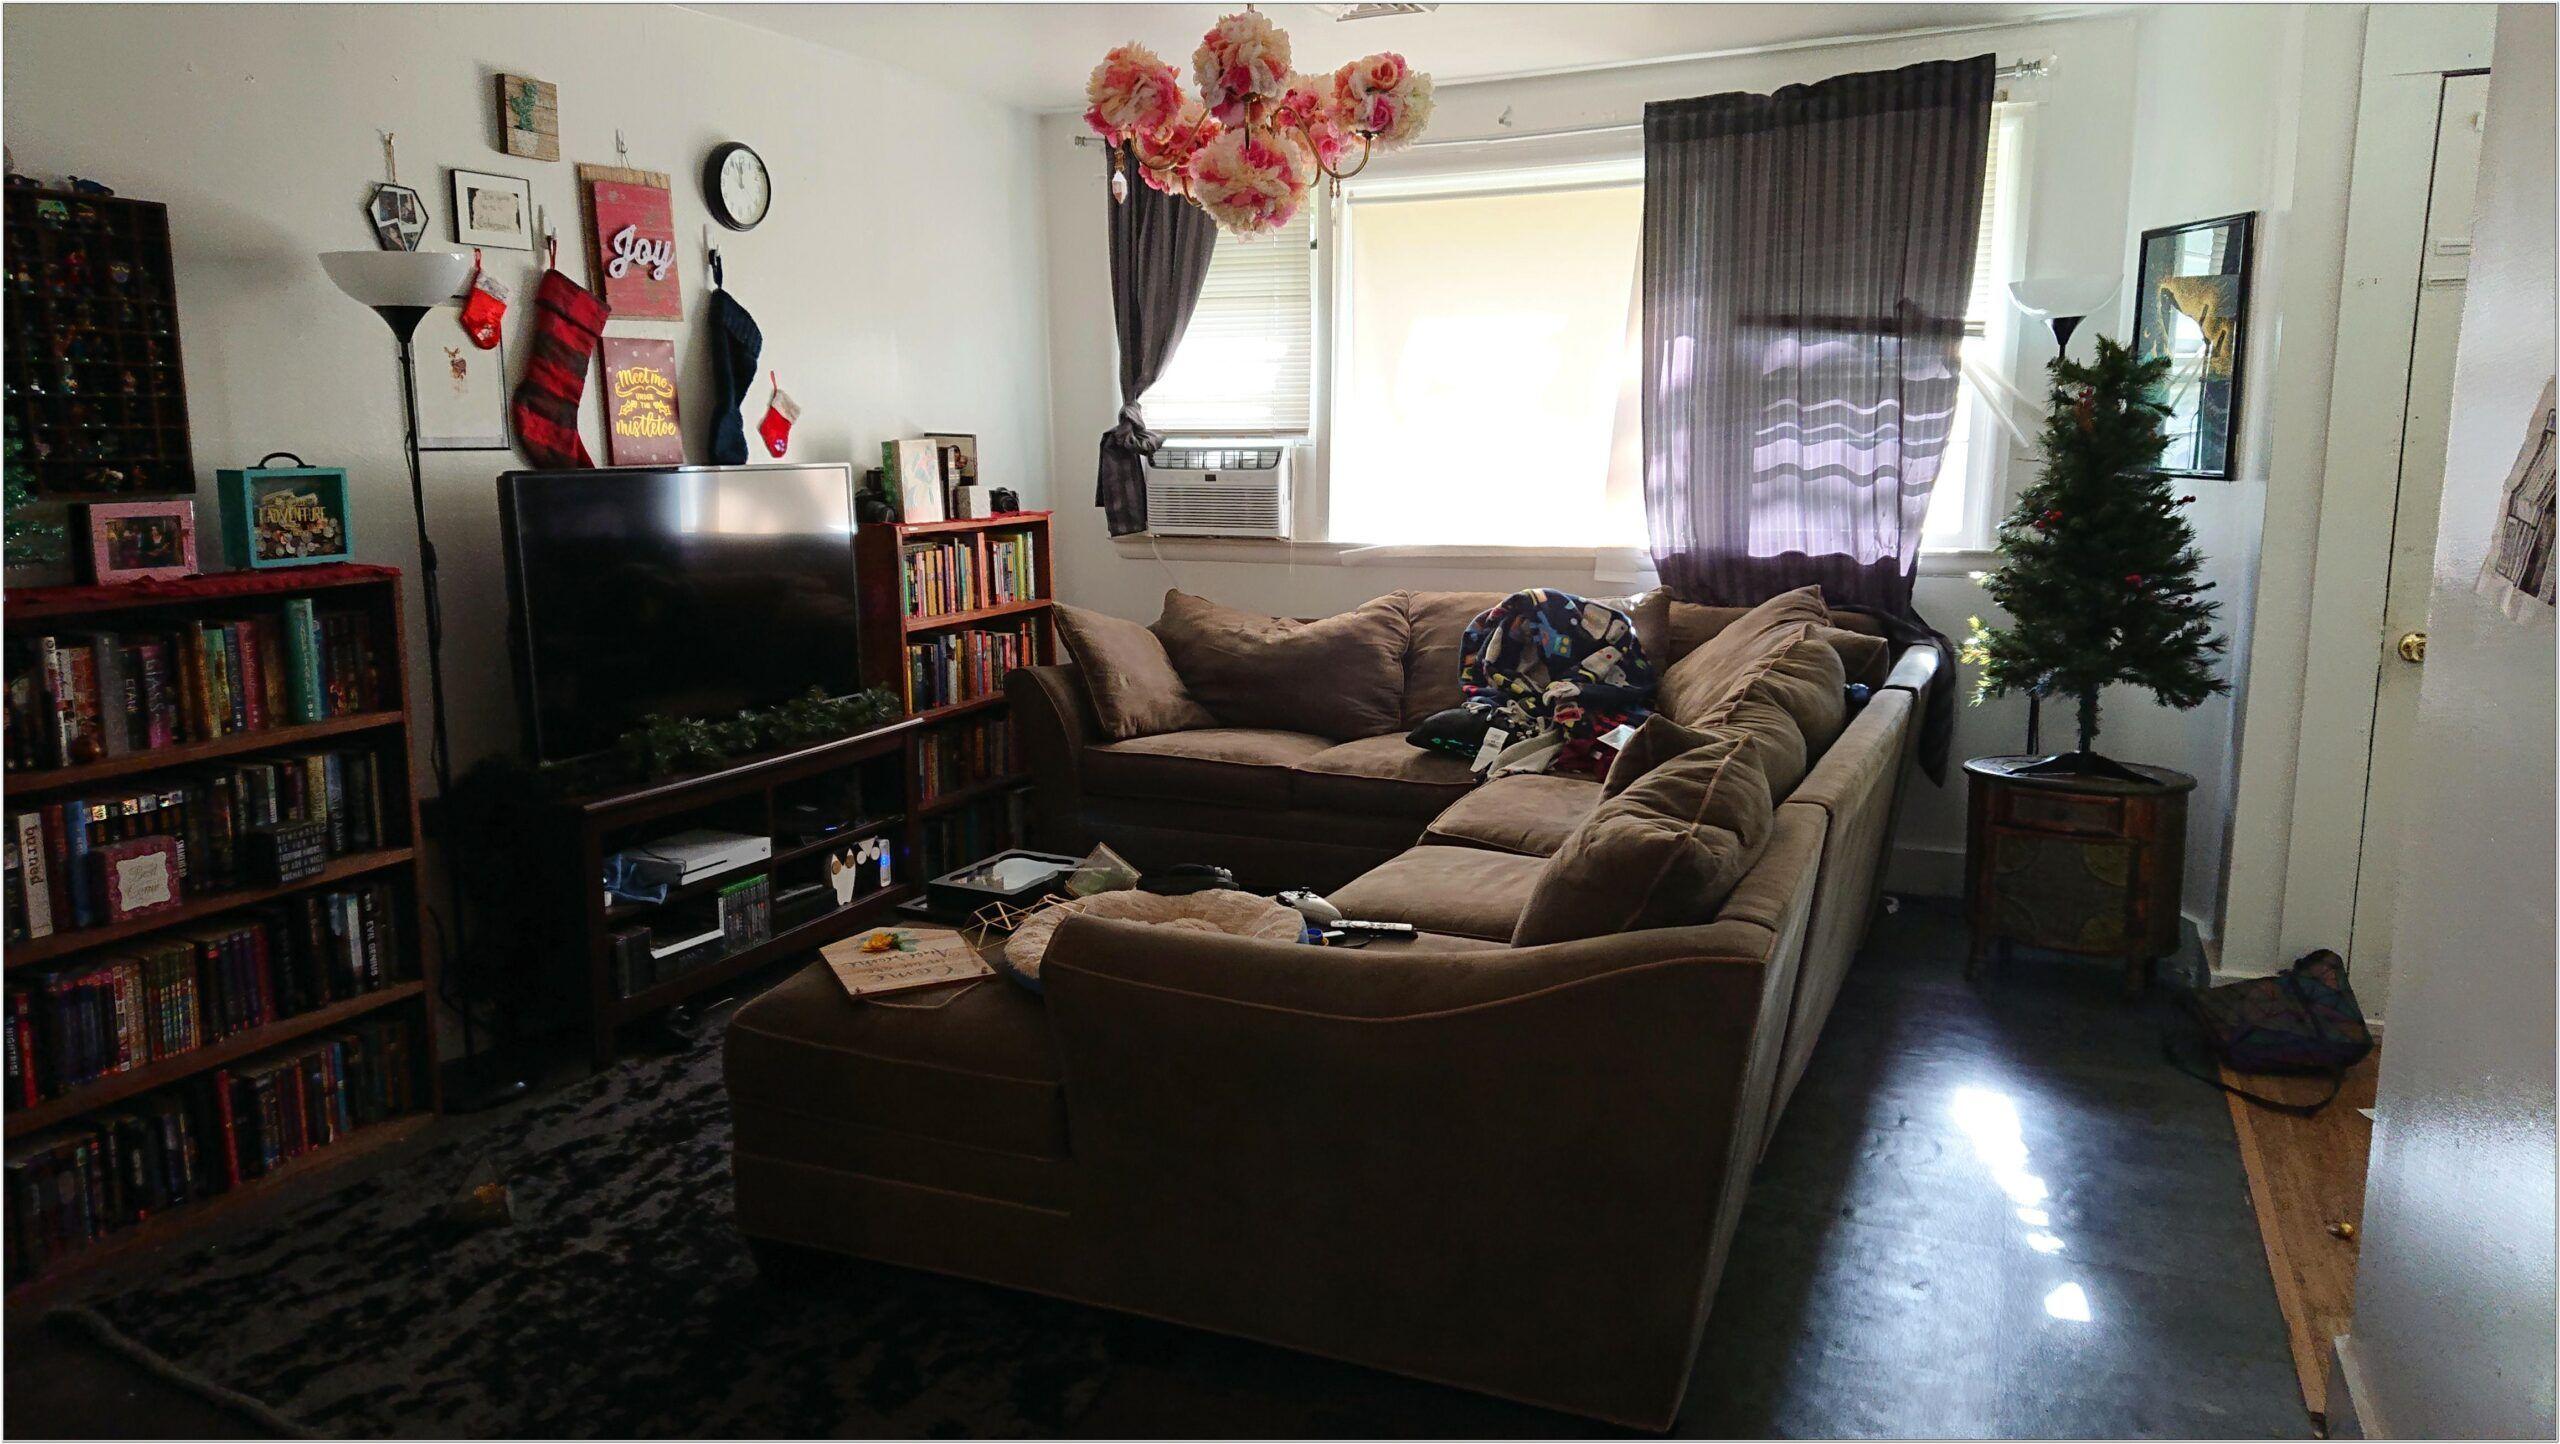 12 X 14 Living Room Design Living Room Designs Yellow Living Room White Decor Living room x 14